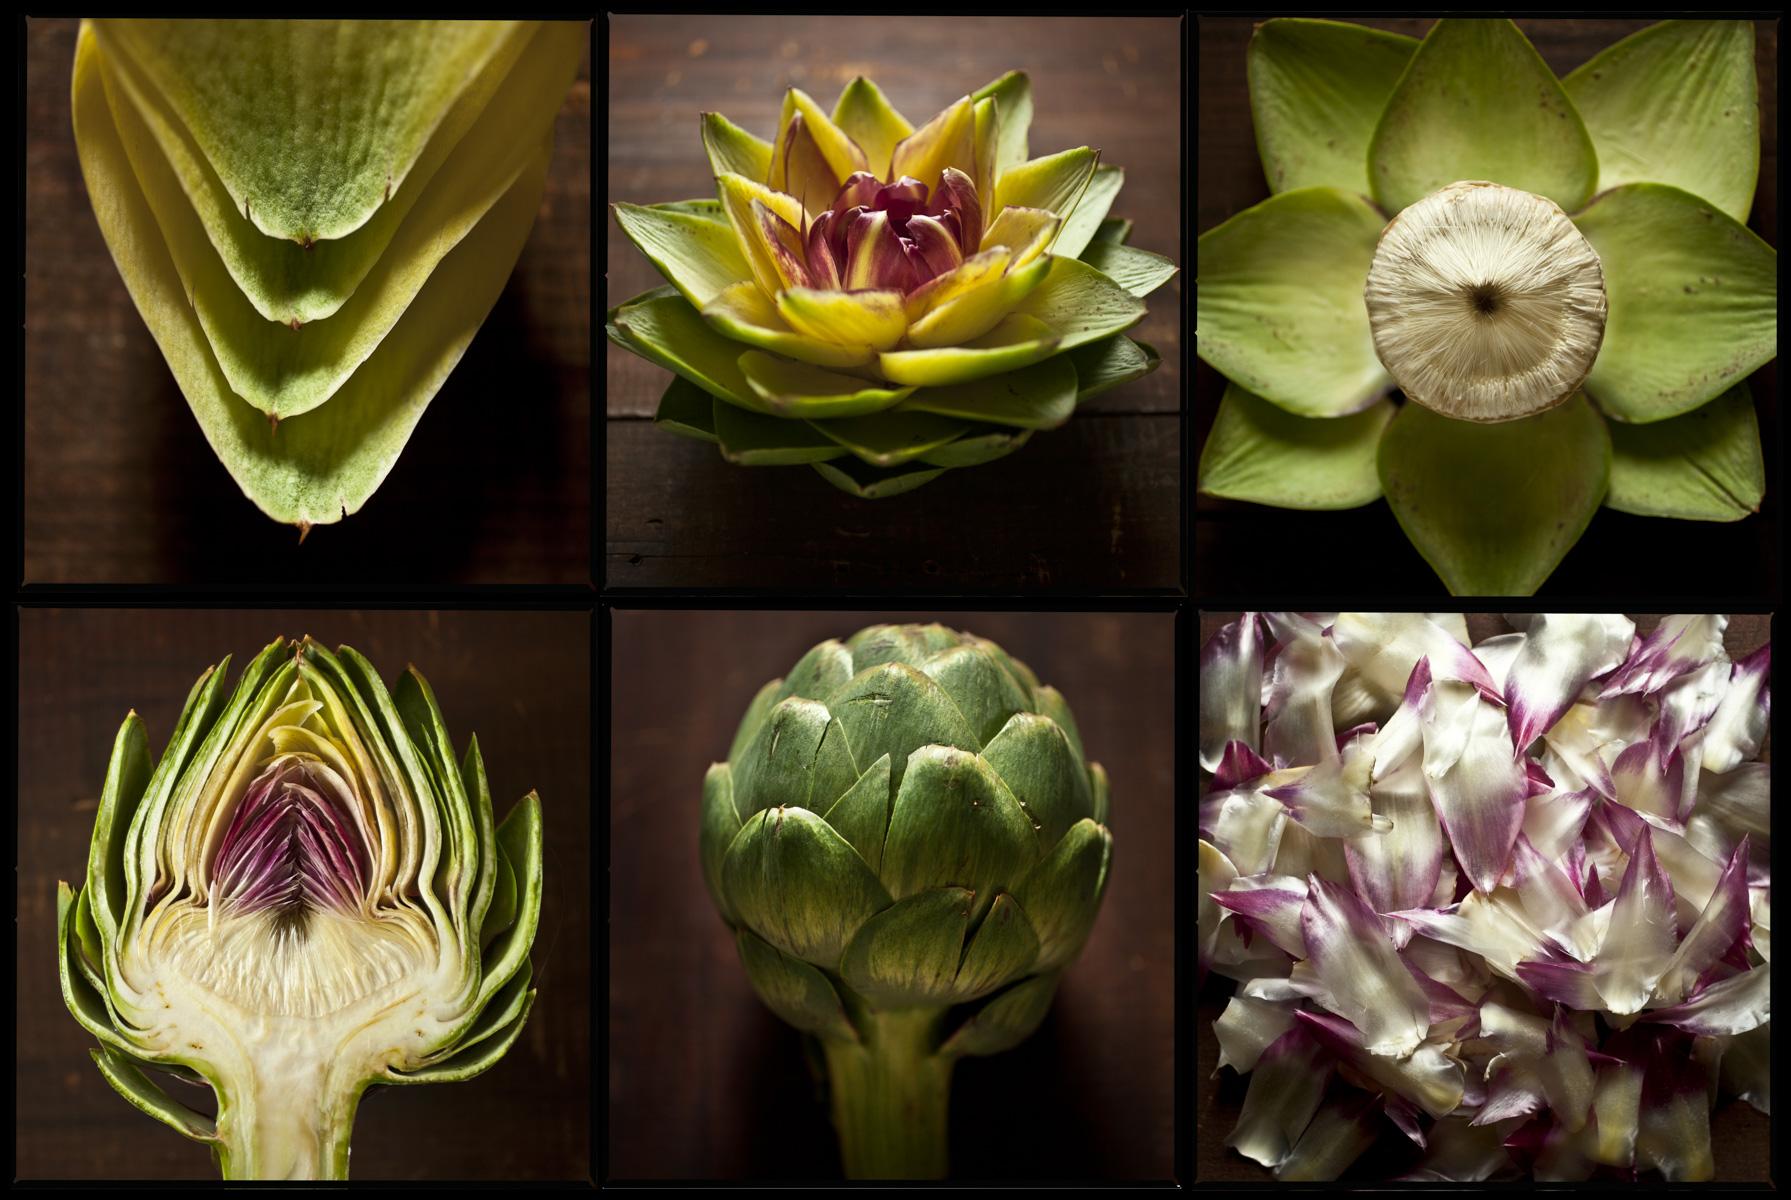 artichoke-study-food-art